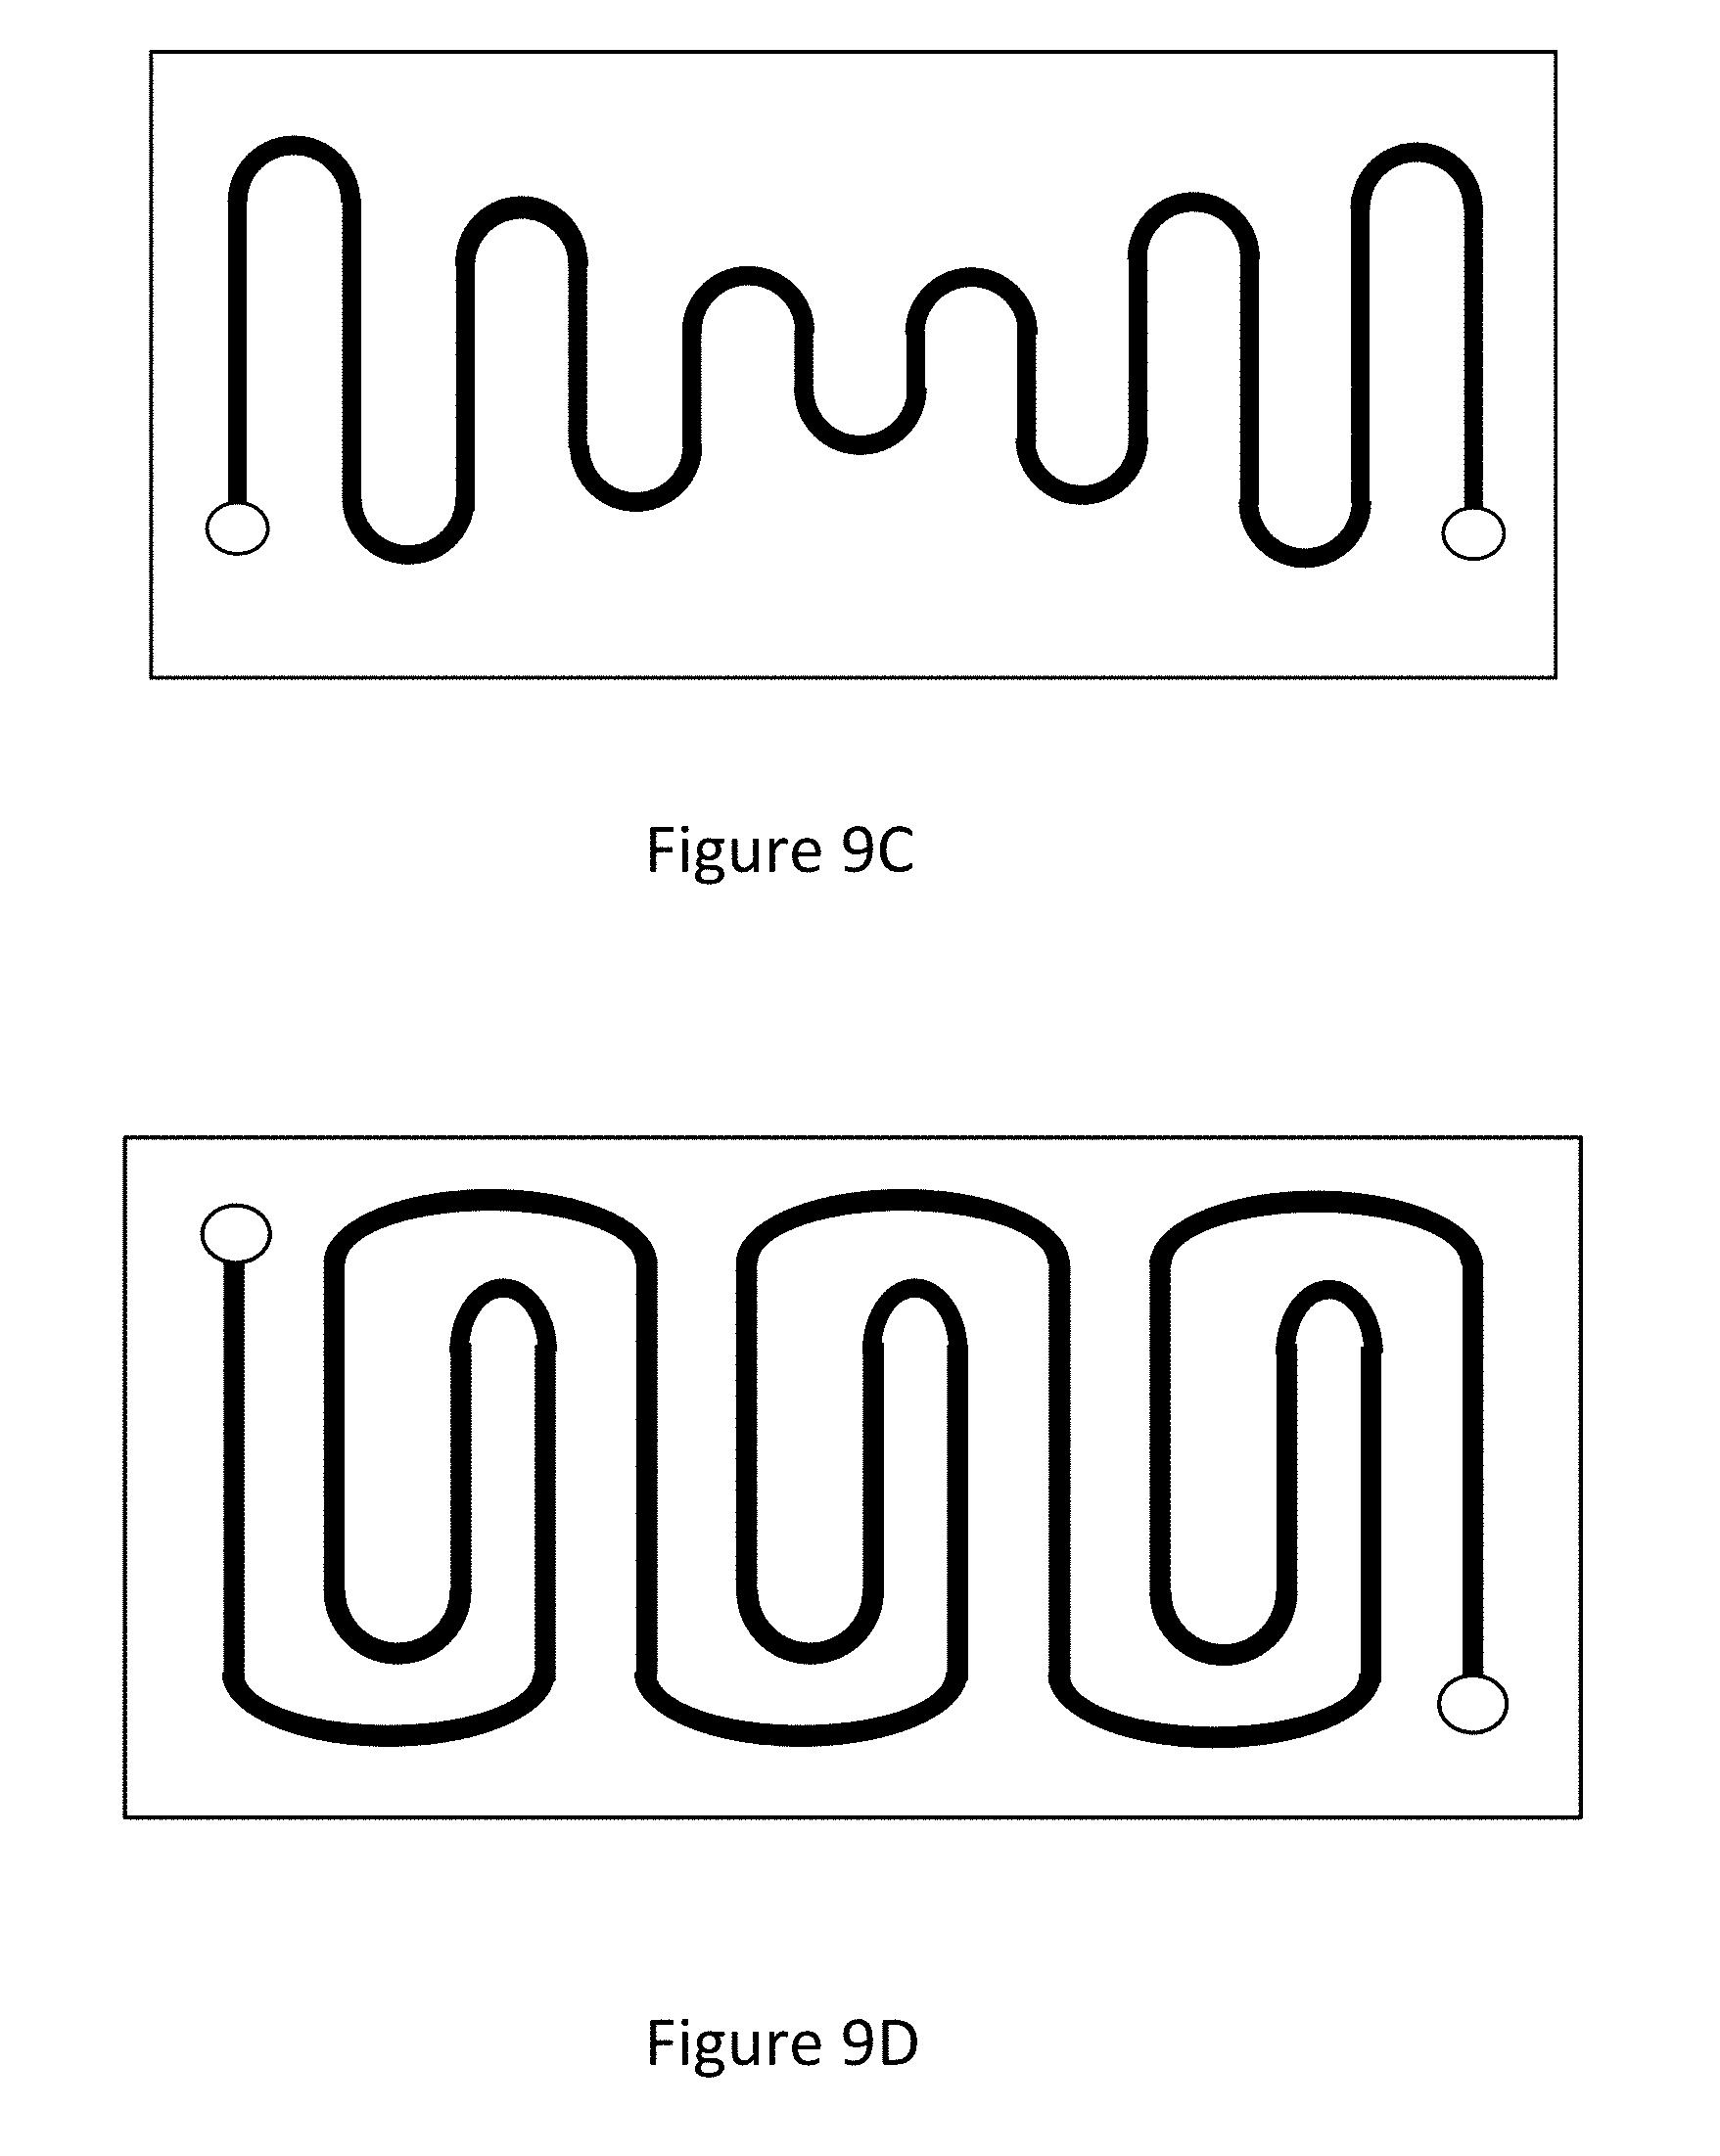 Patent US 10,079,515 B2